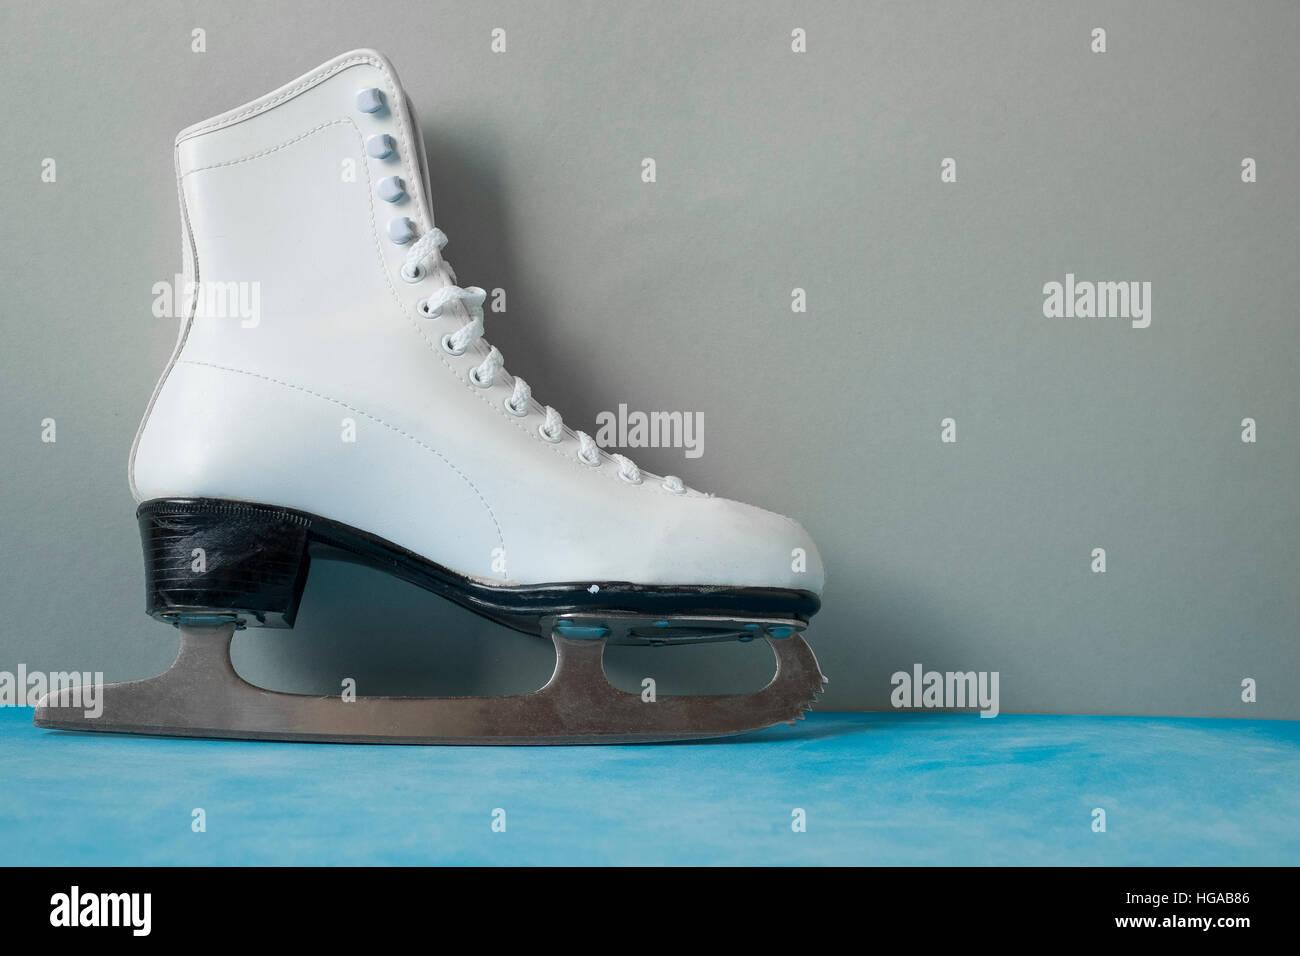 Vintage ice skate on the gray/blue vintage background - Stock Image